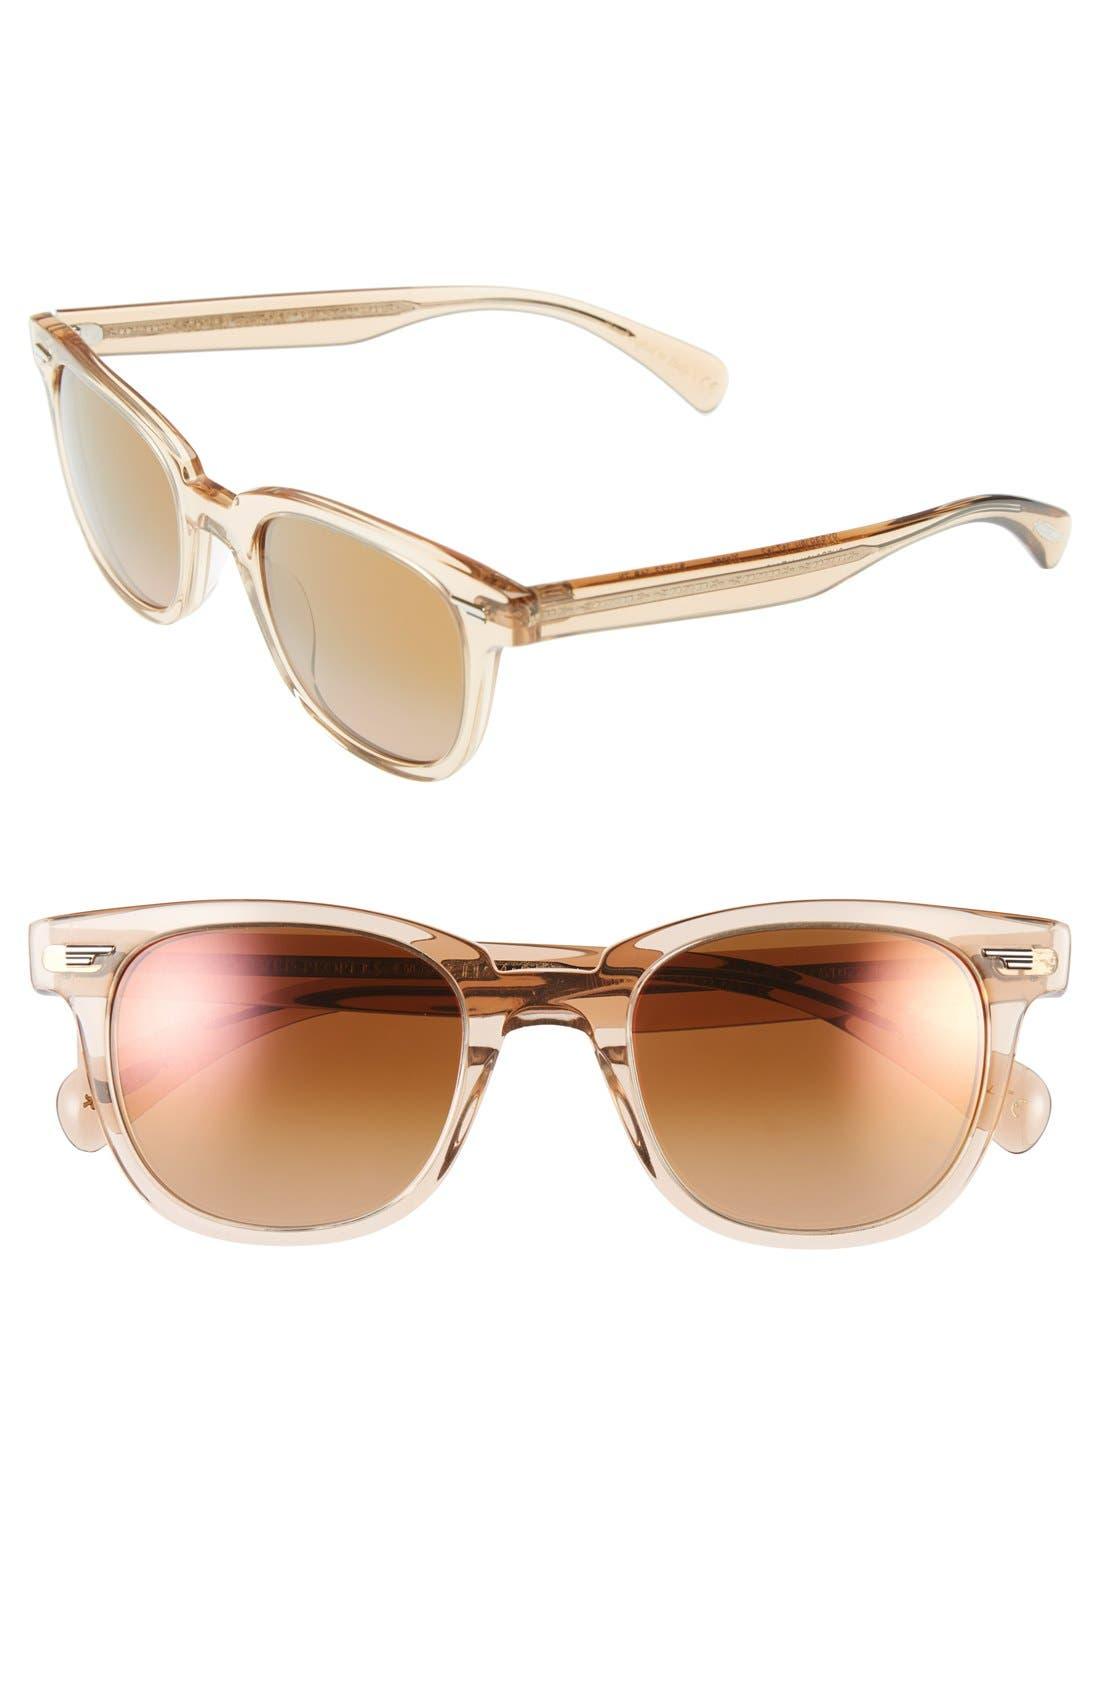 Main Image - Oliver Peoples 'Masek' 51mm Retro Sunglasses